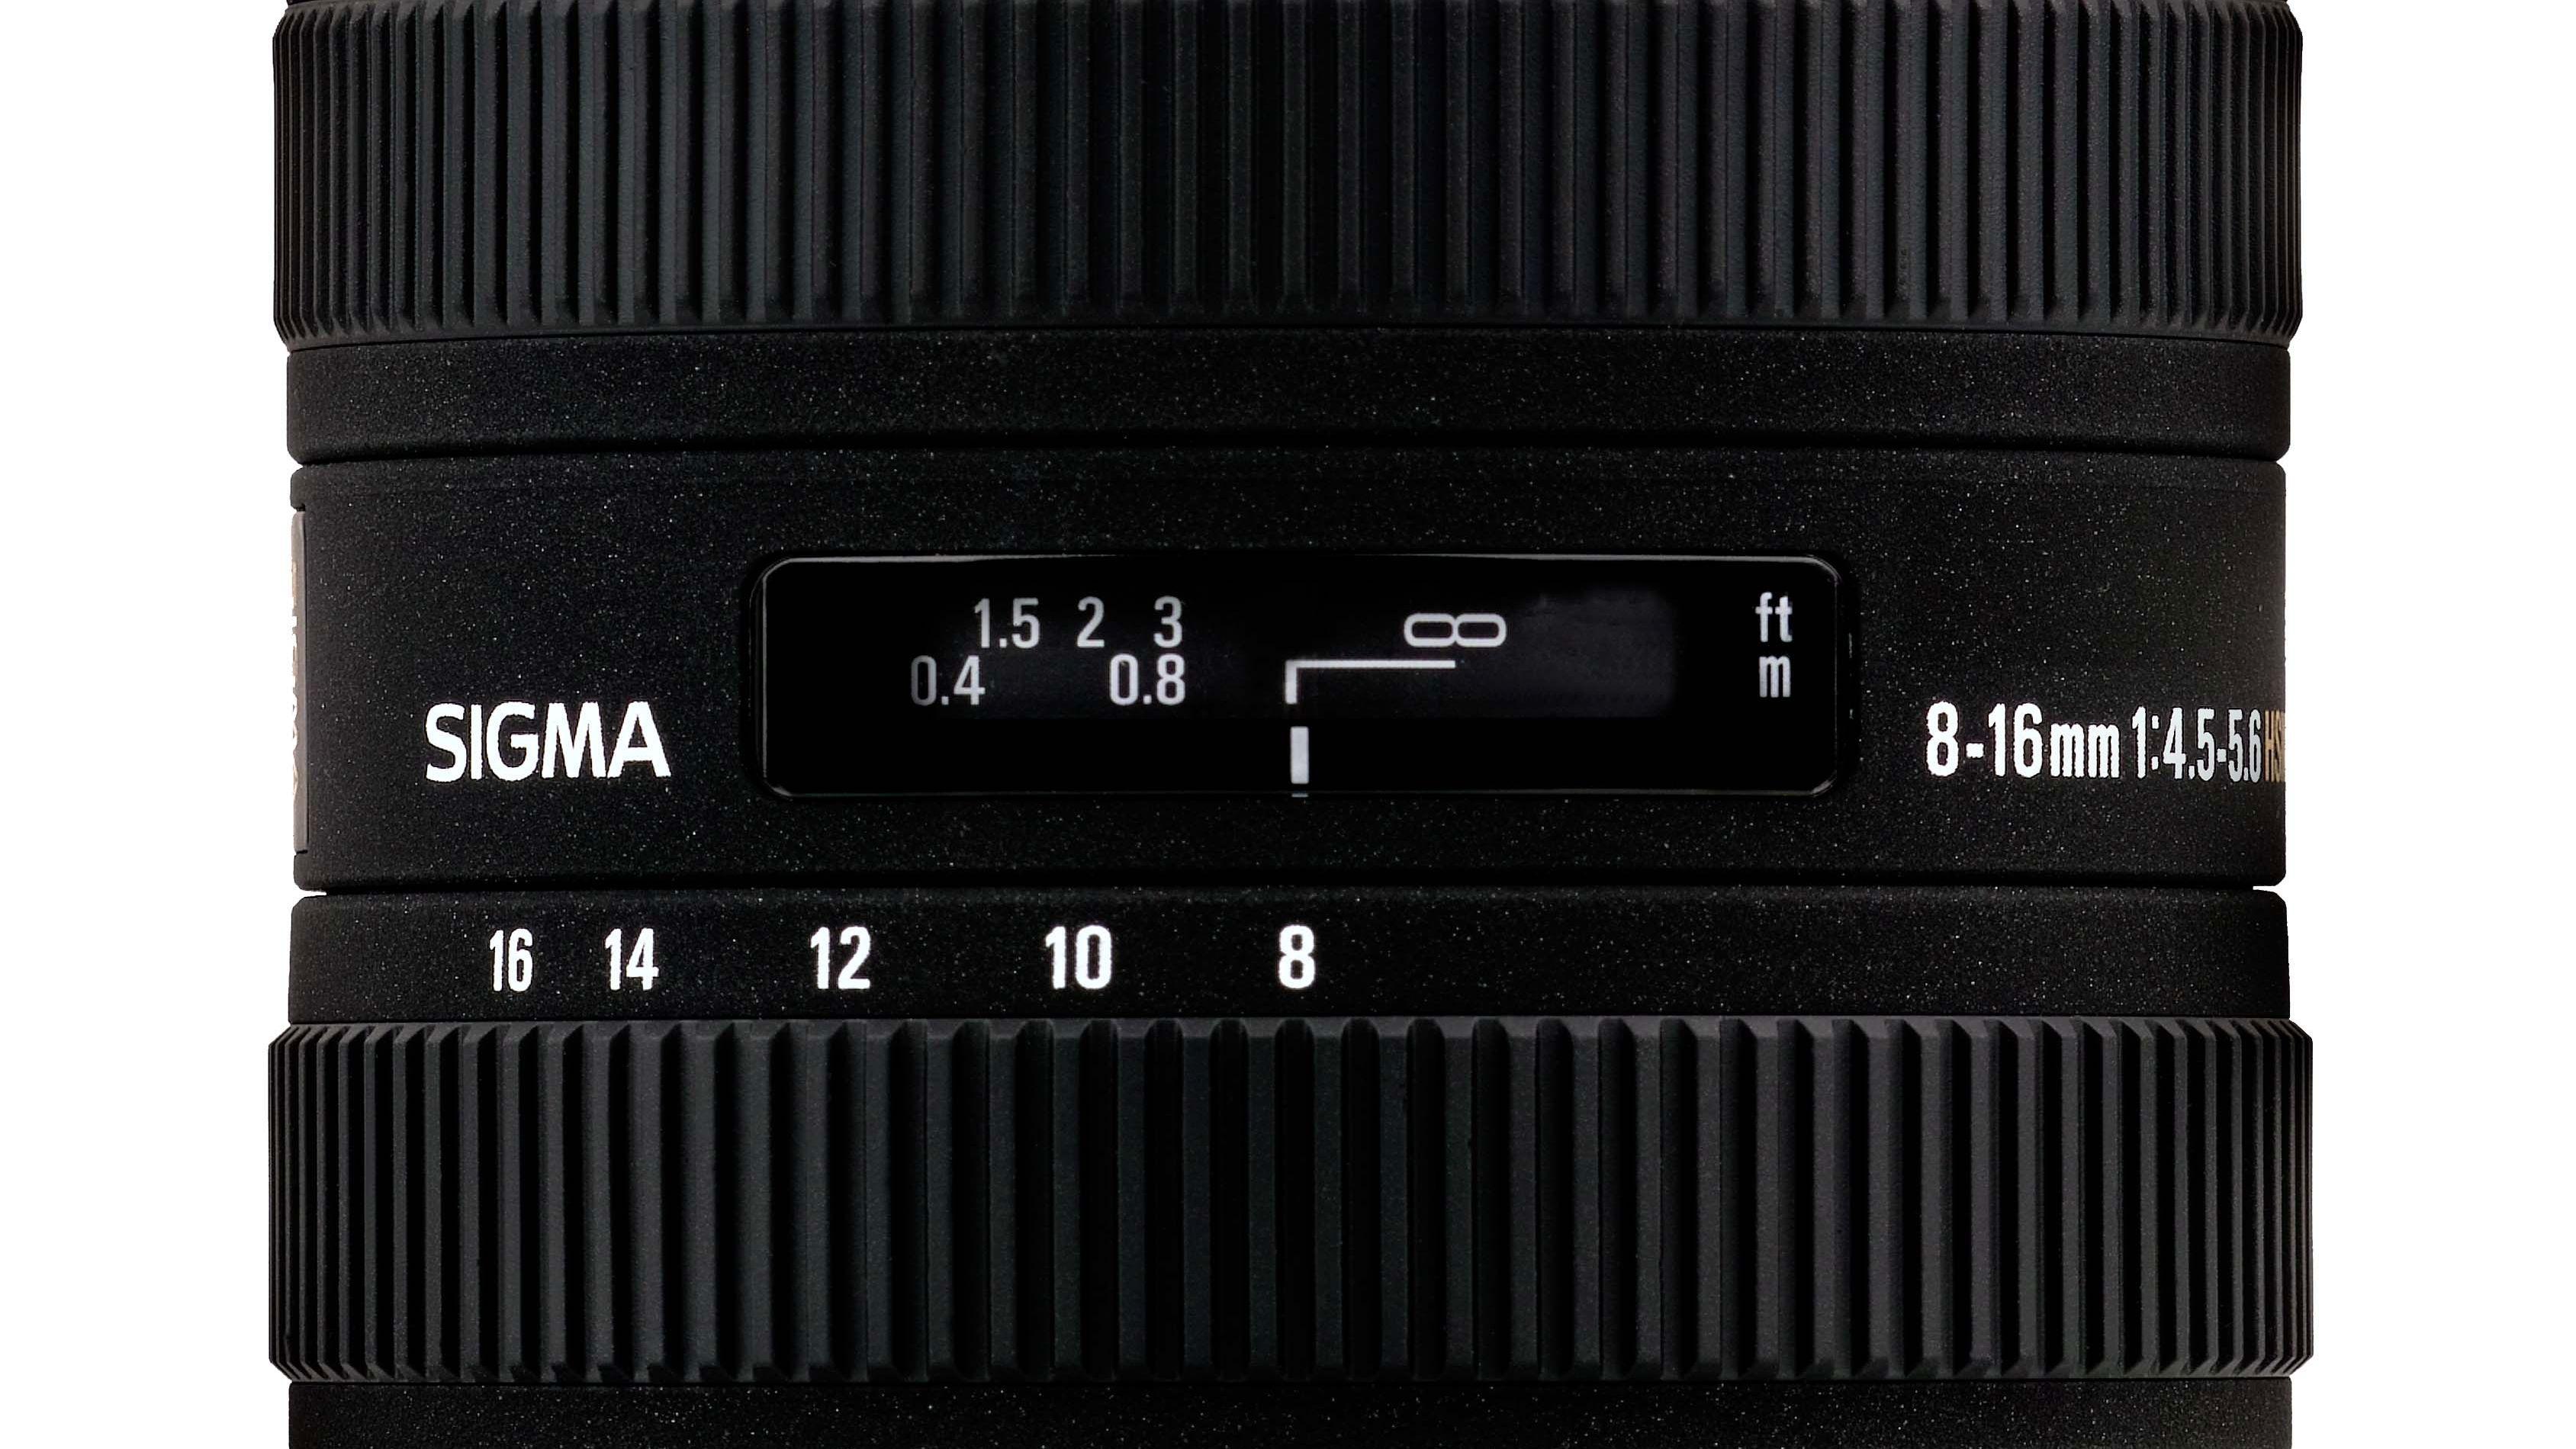 Sigma 8 - 16mm F4.5-5-6 DC HSM